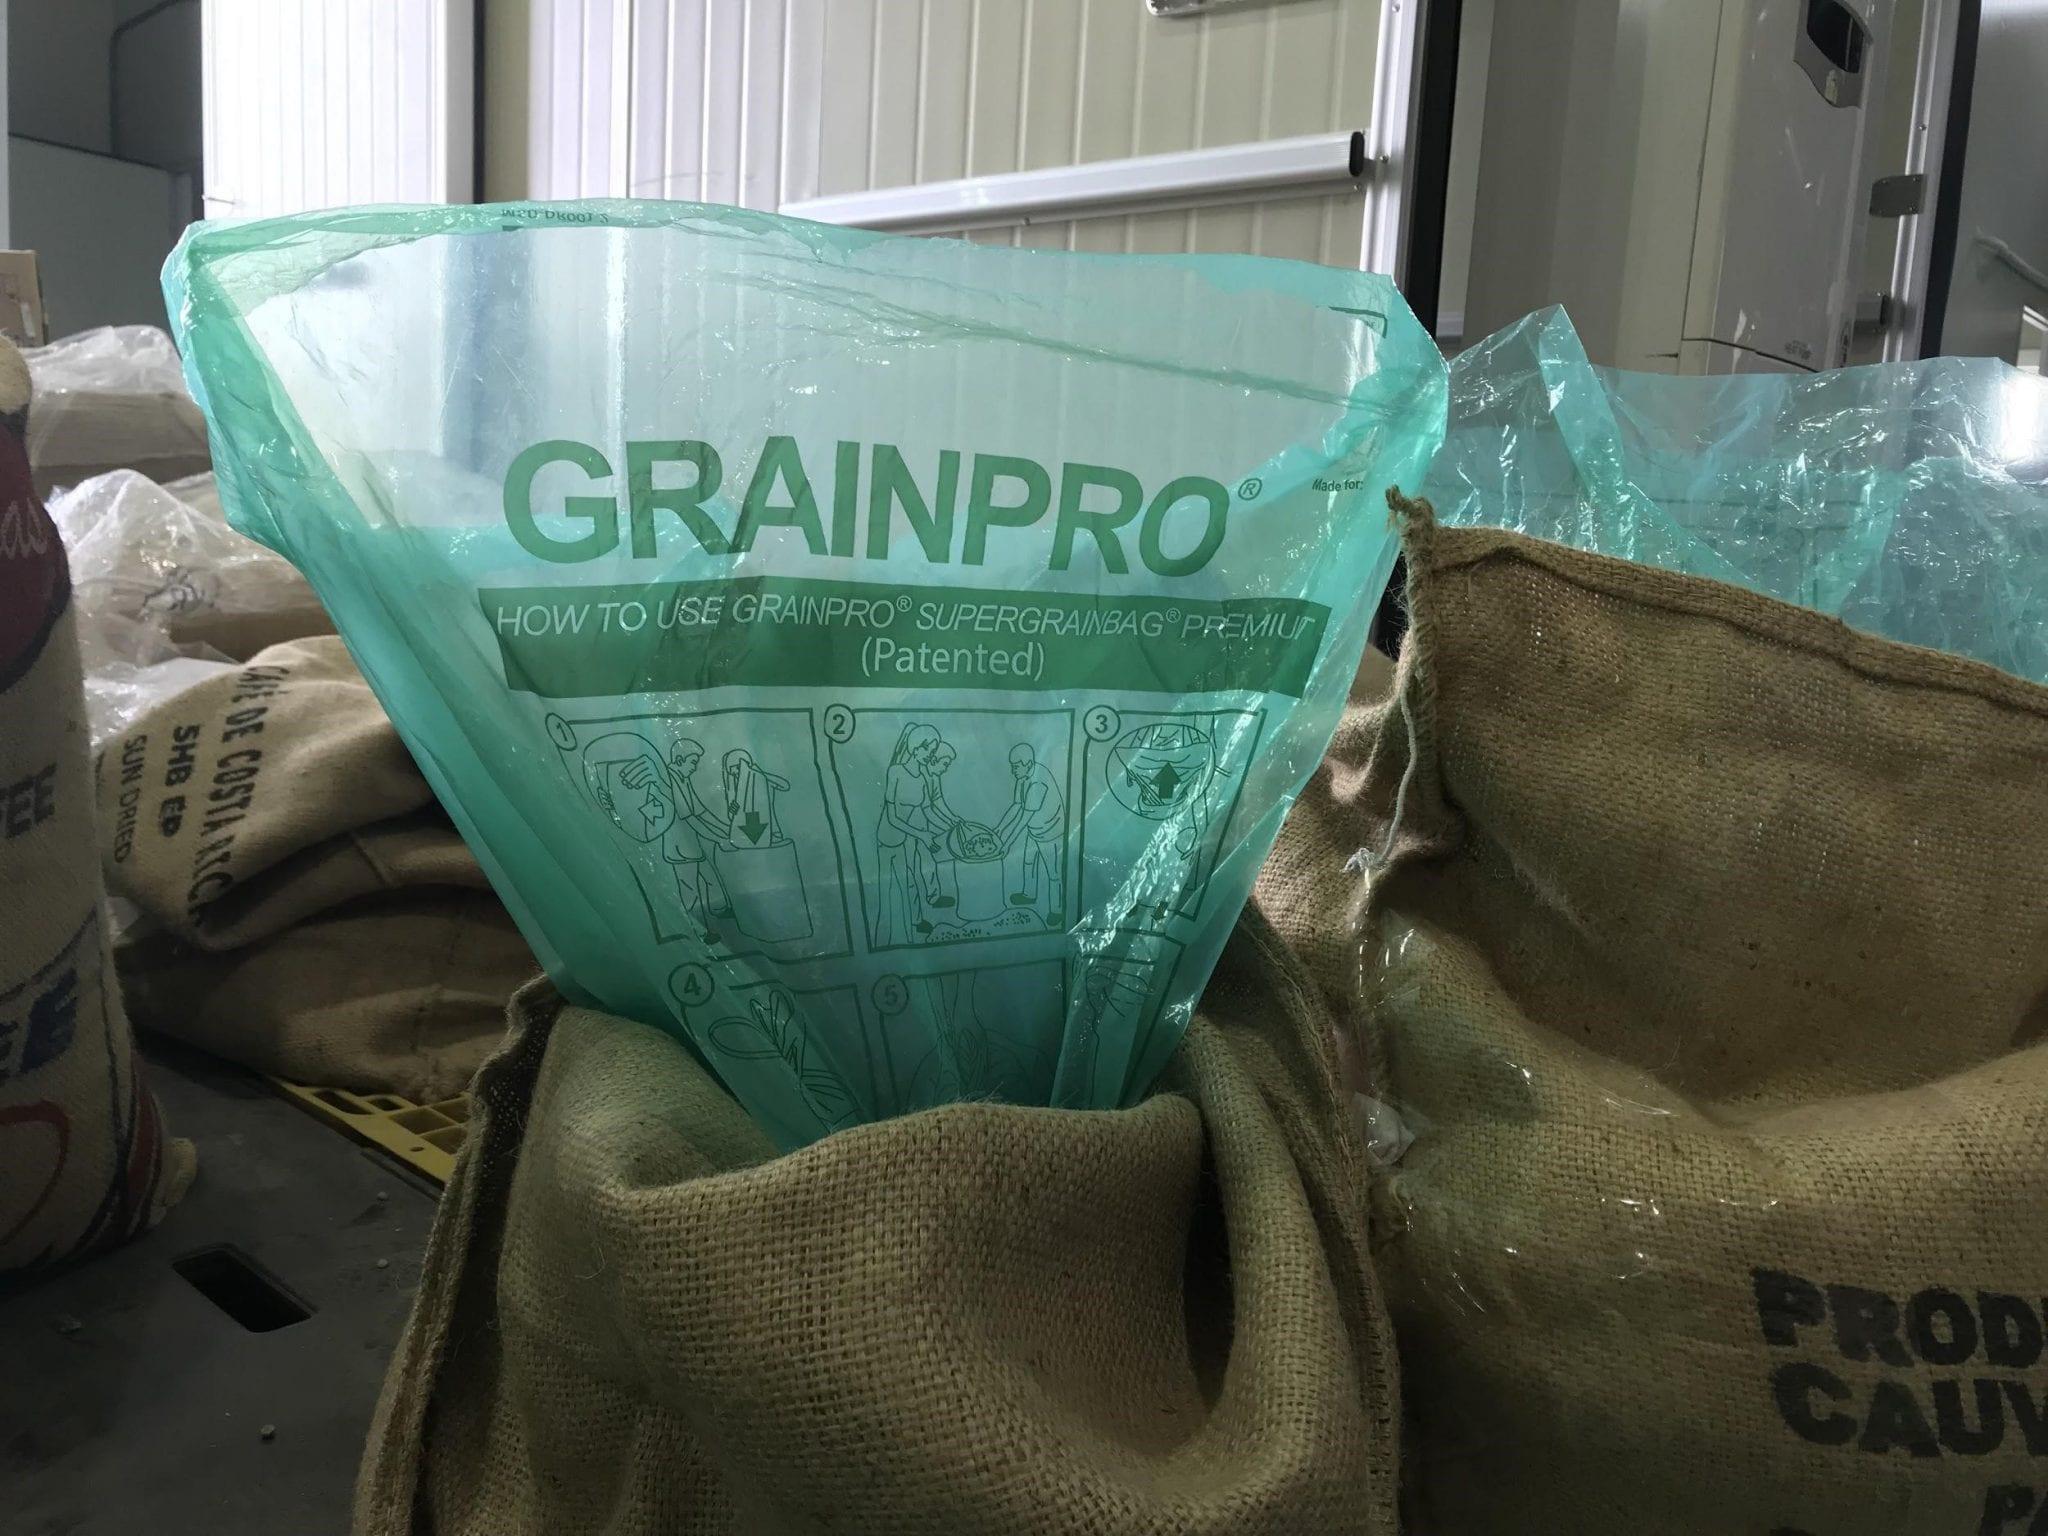 Grainpro bags